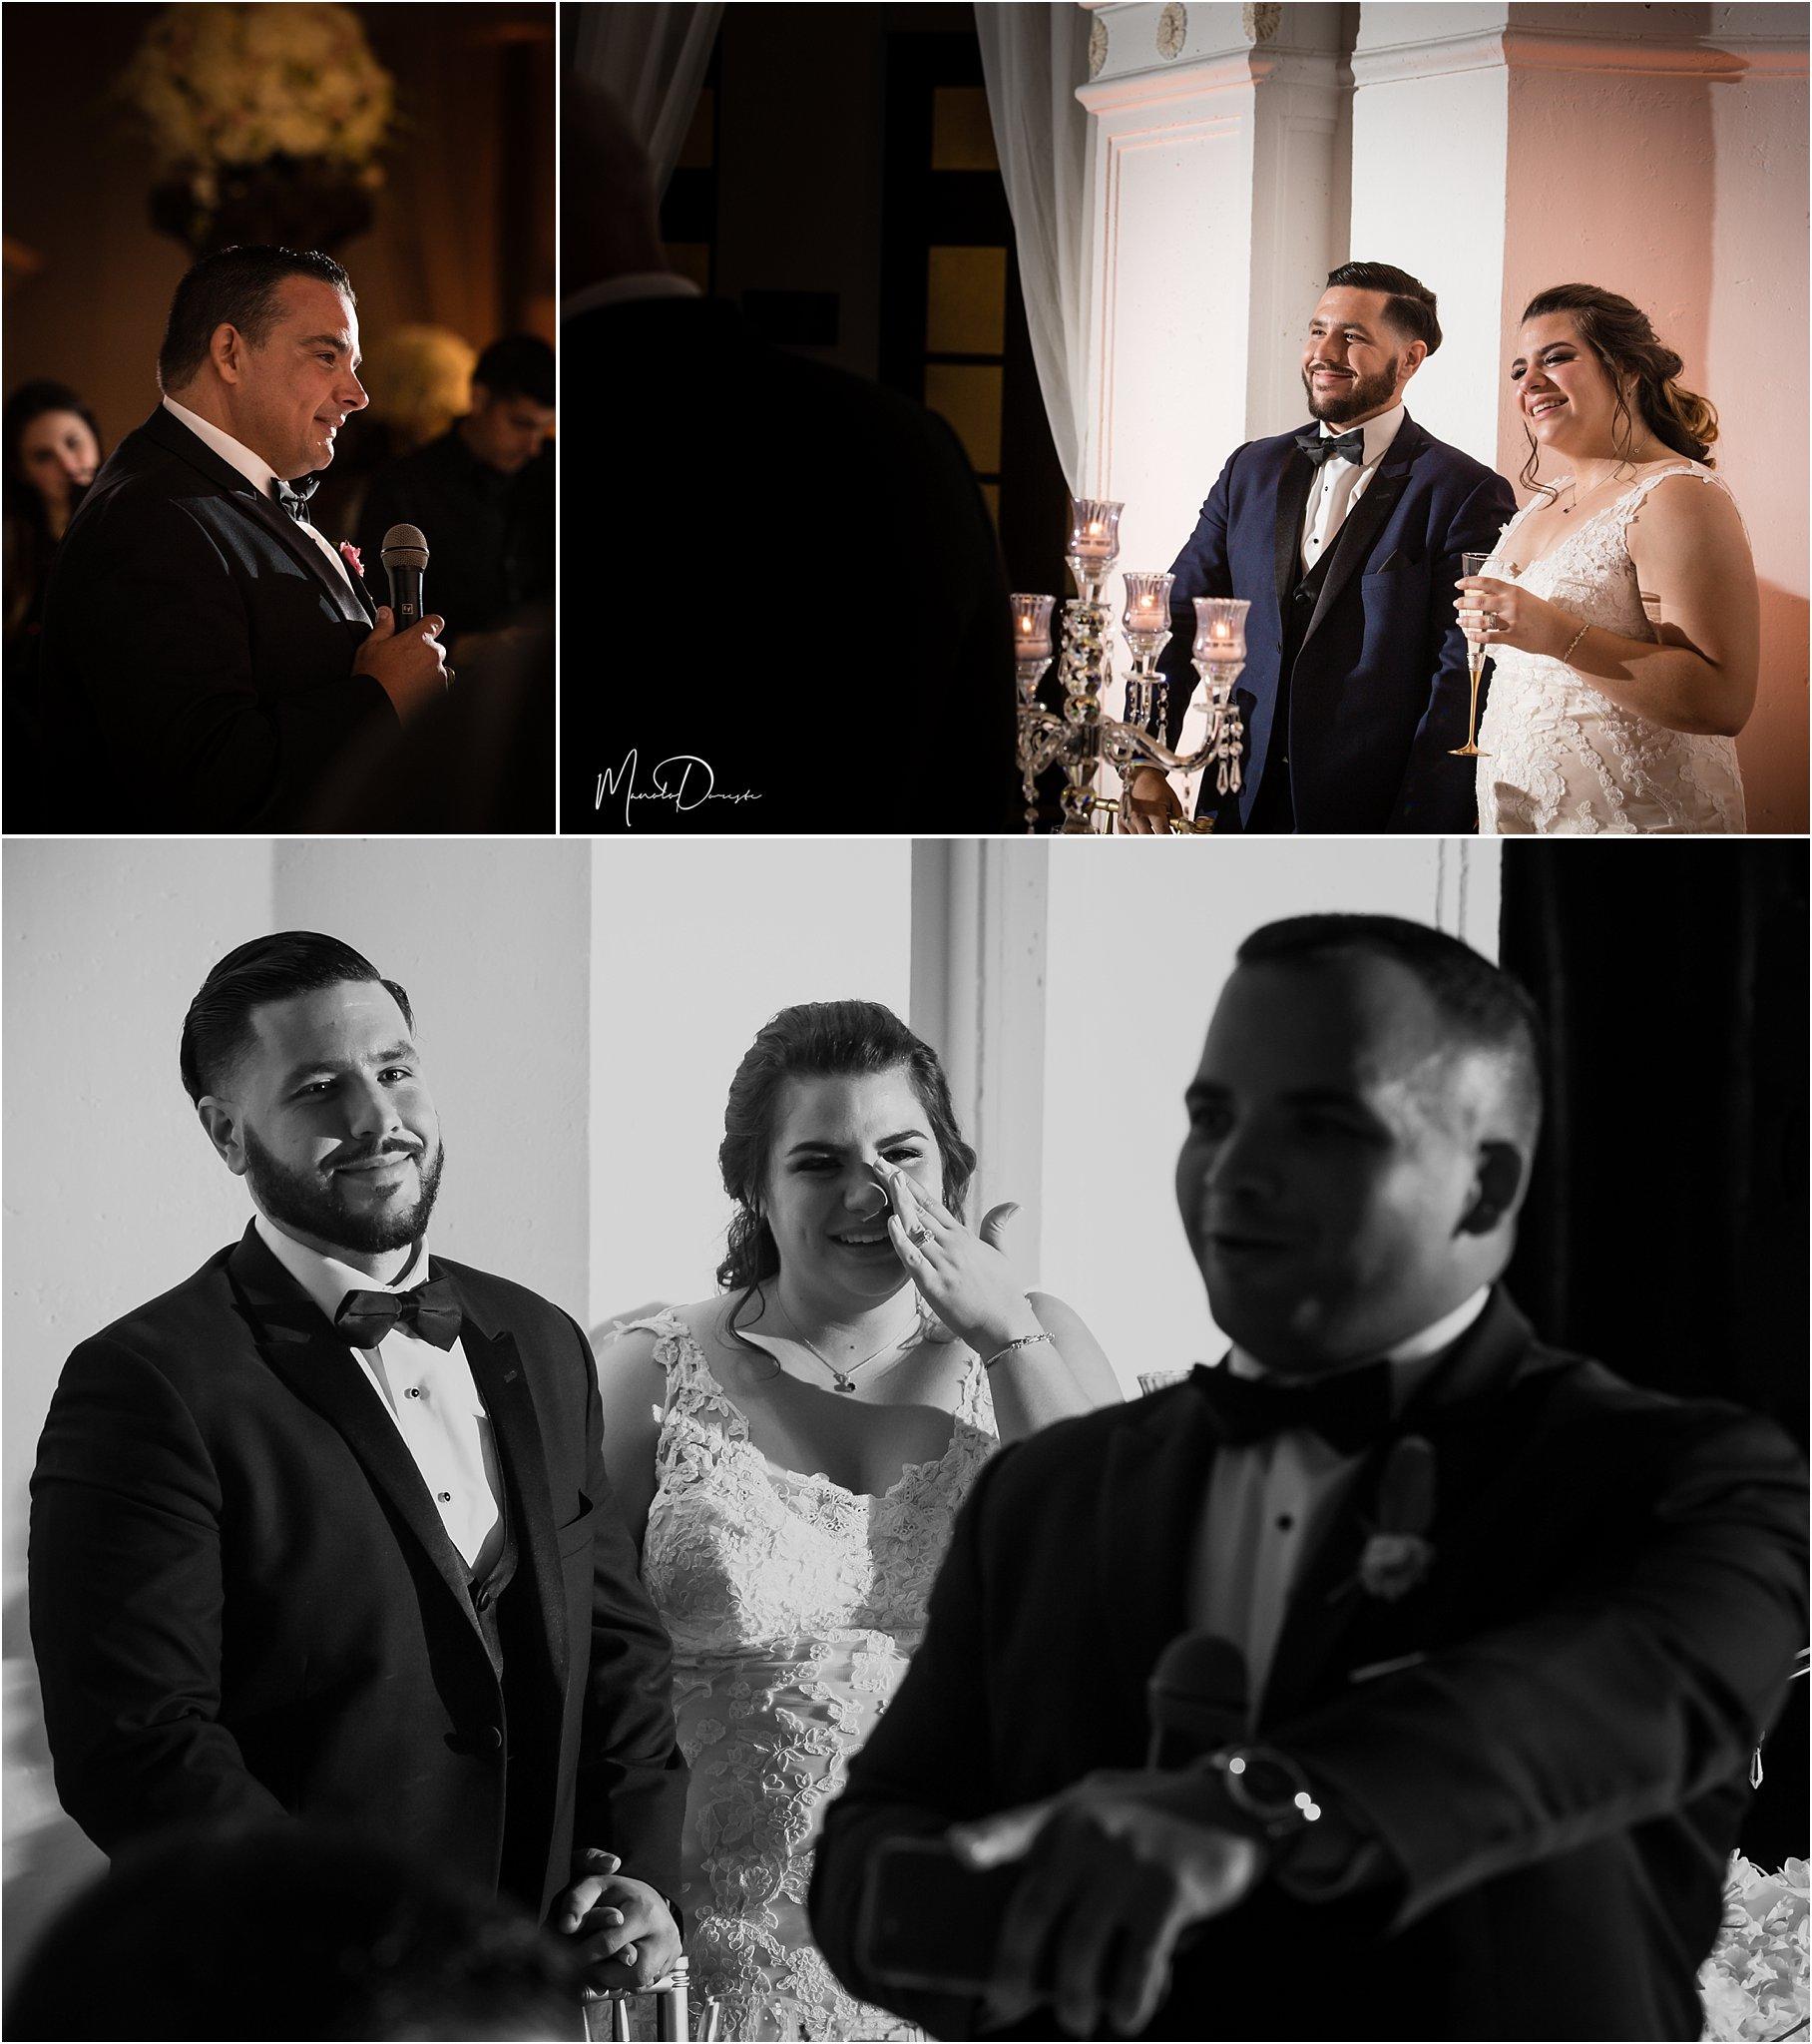 0376_ManoloDoreste_InFocusStudios_Wedding_Family_Photography_Miami_MiamiPhotographer.jpg